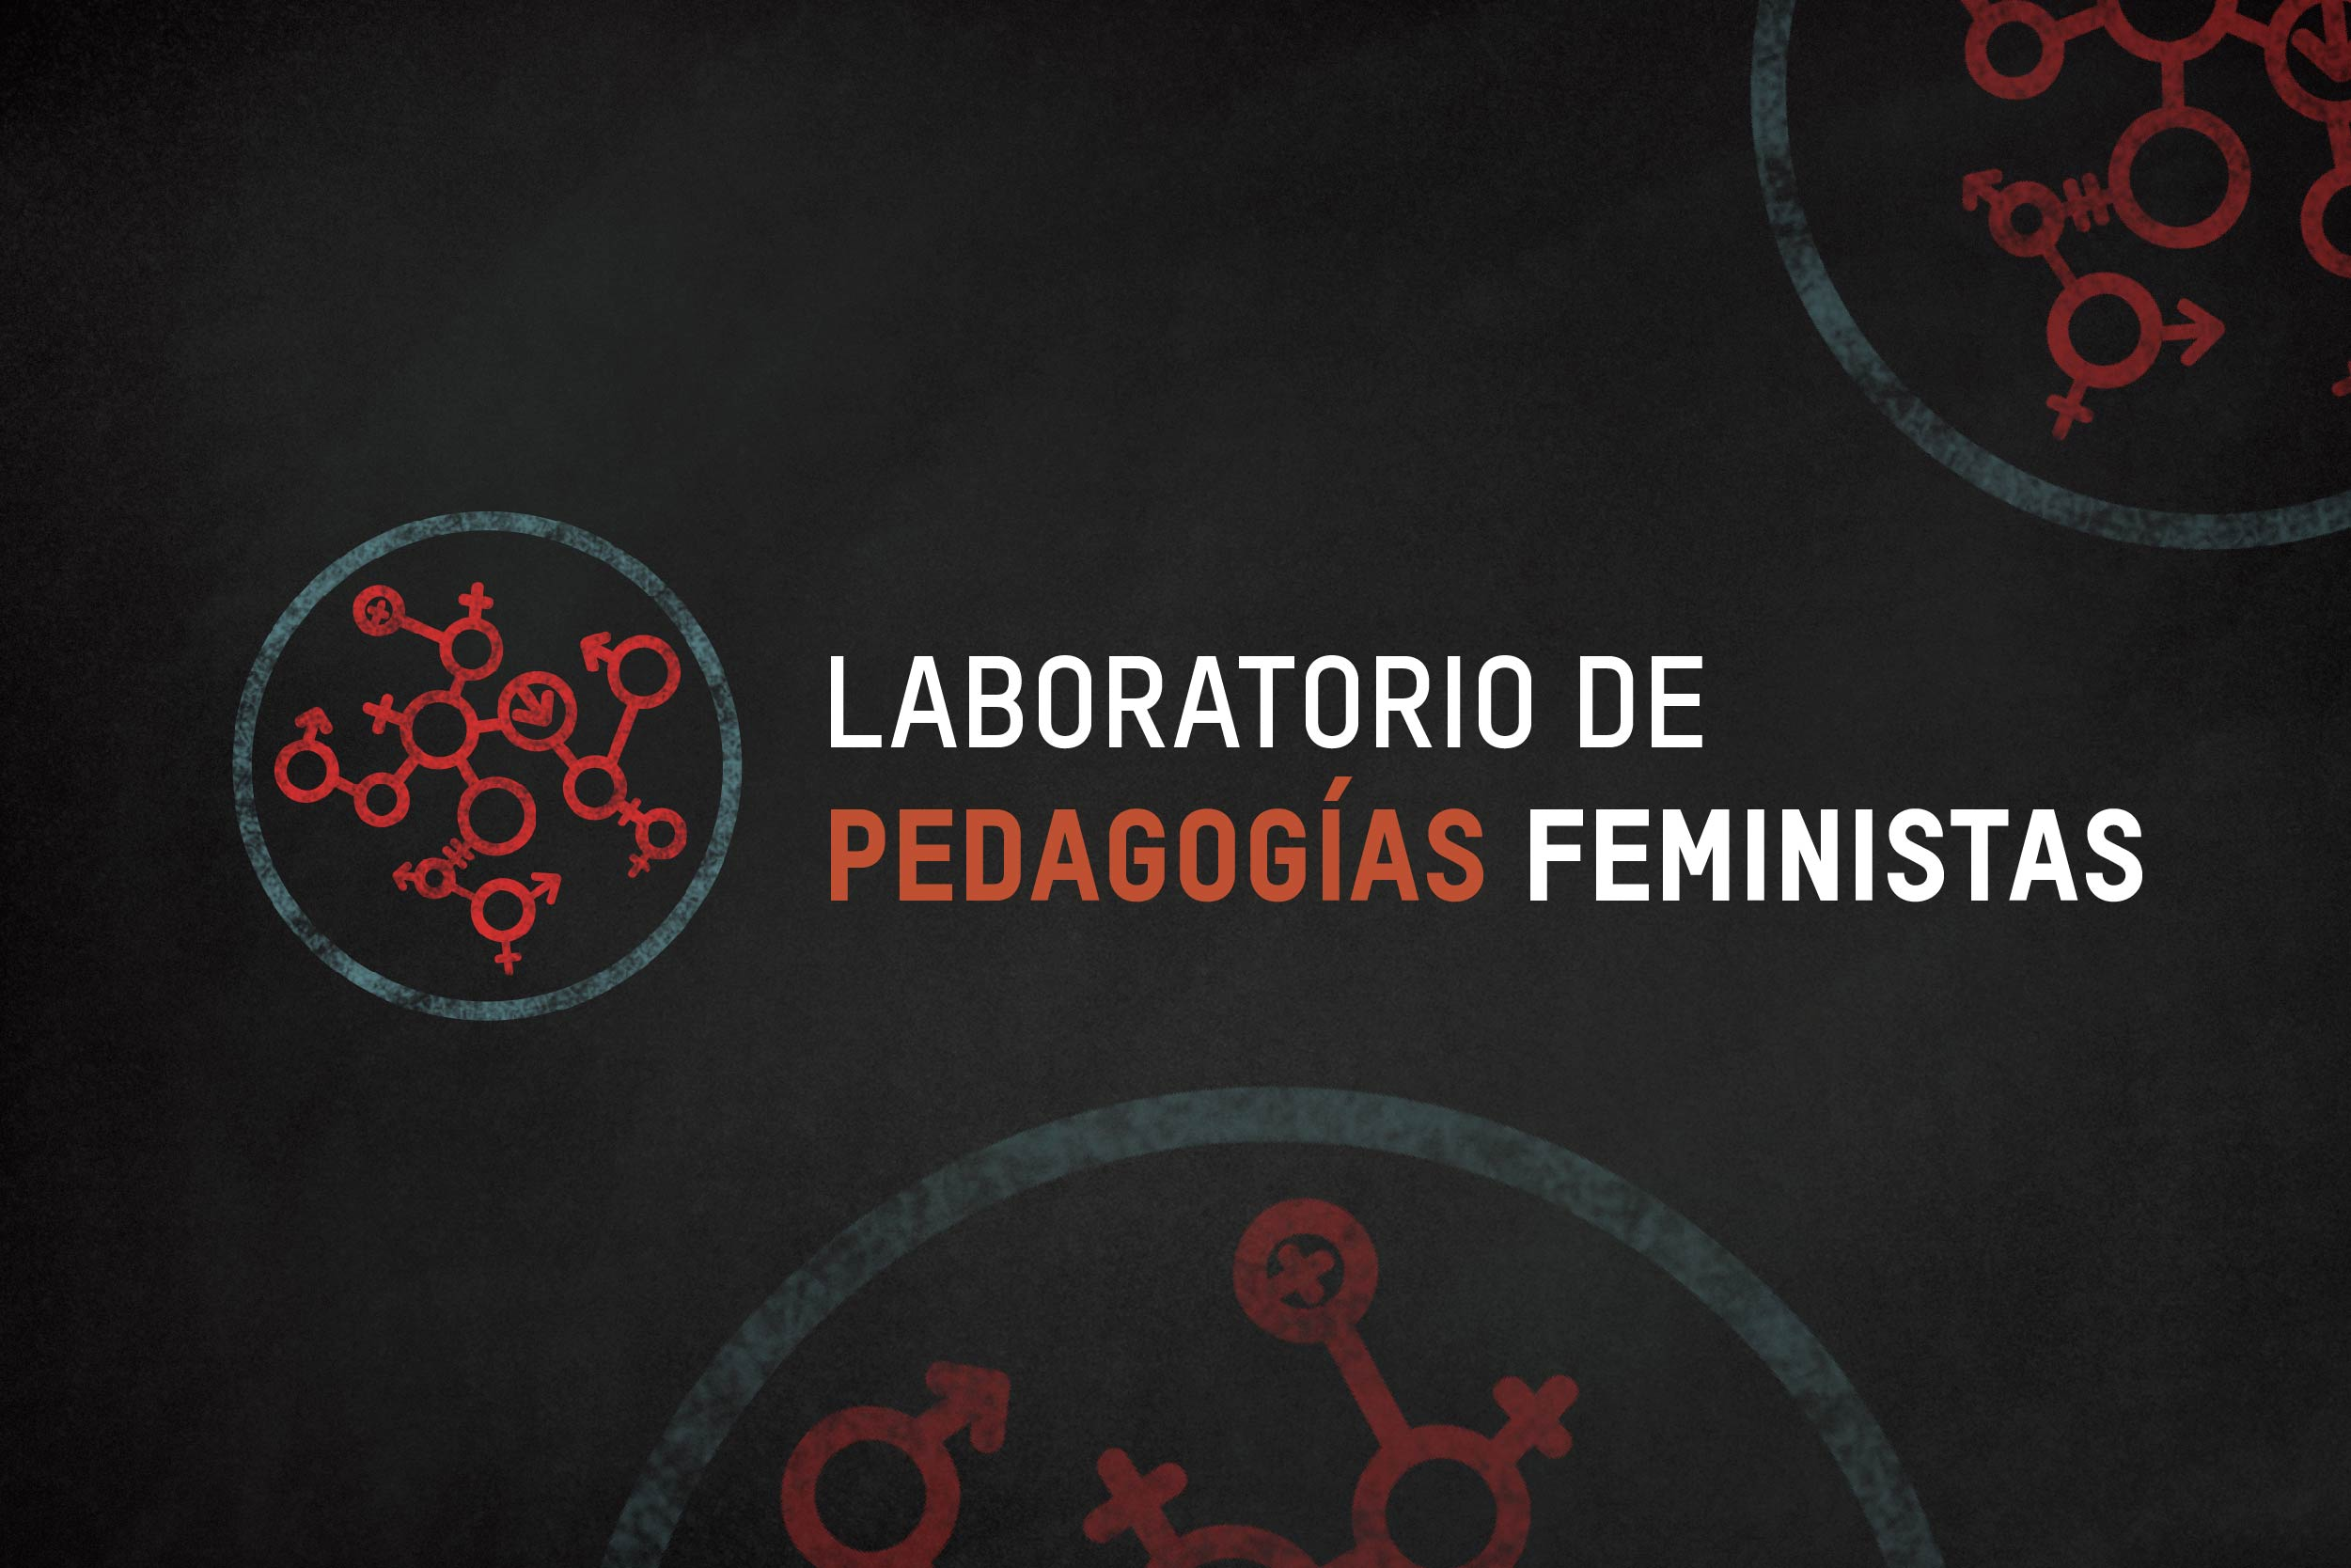 laboratorio de pedagogías feministas